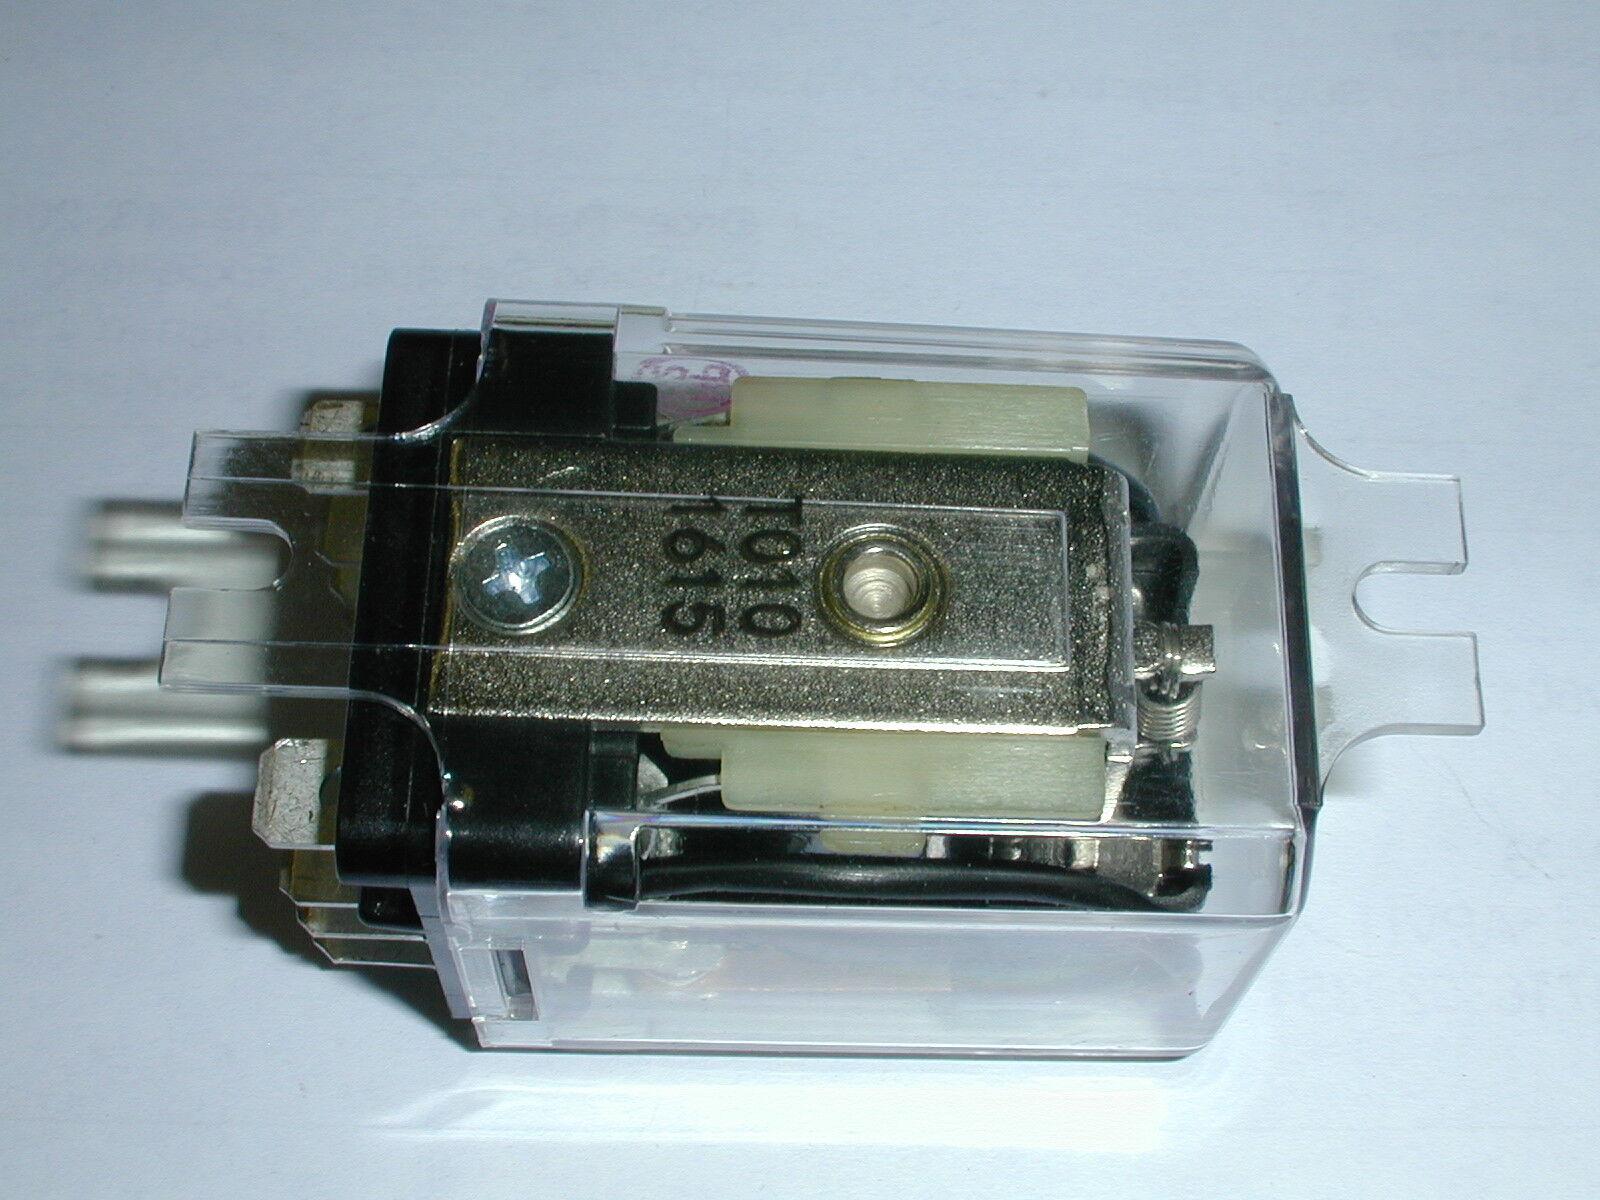 1PCS HG2-DC12V DIP HG Series 20A DPDT 12 VDC Plug-In General Purpose Cube PoweBe